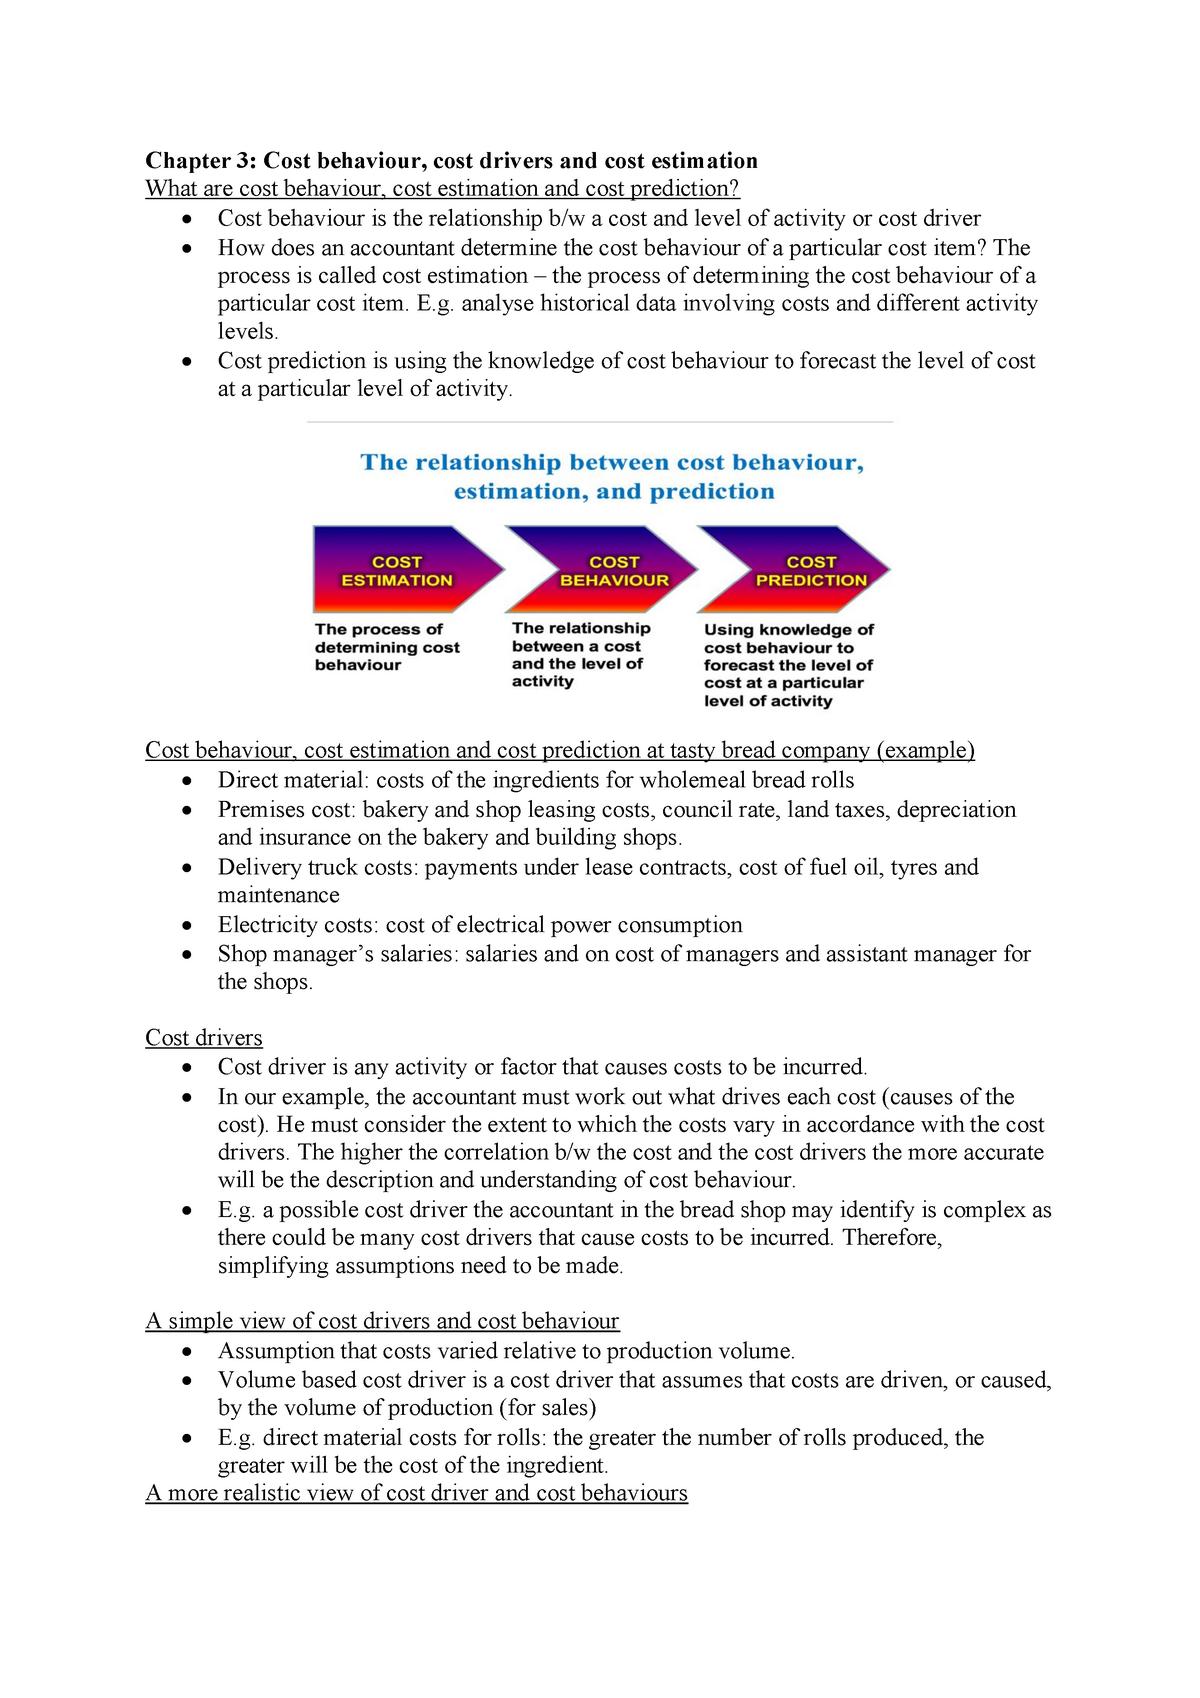 Chapter 3 MA - Lecture notes 3 - ACC2200 - Monash - StuDocu